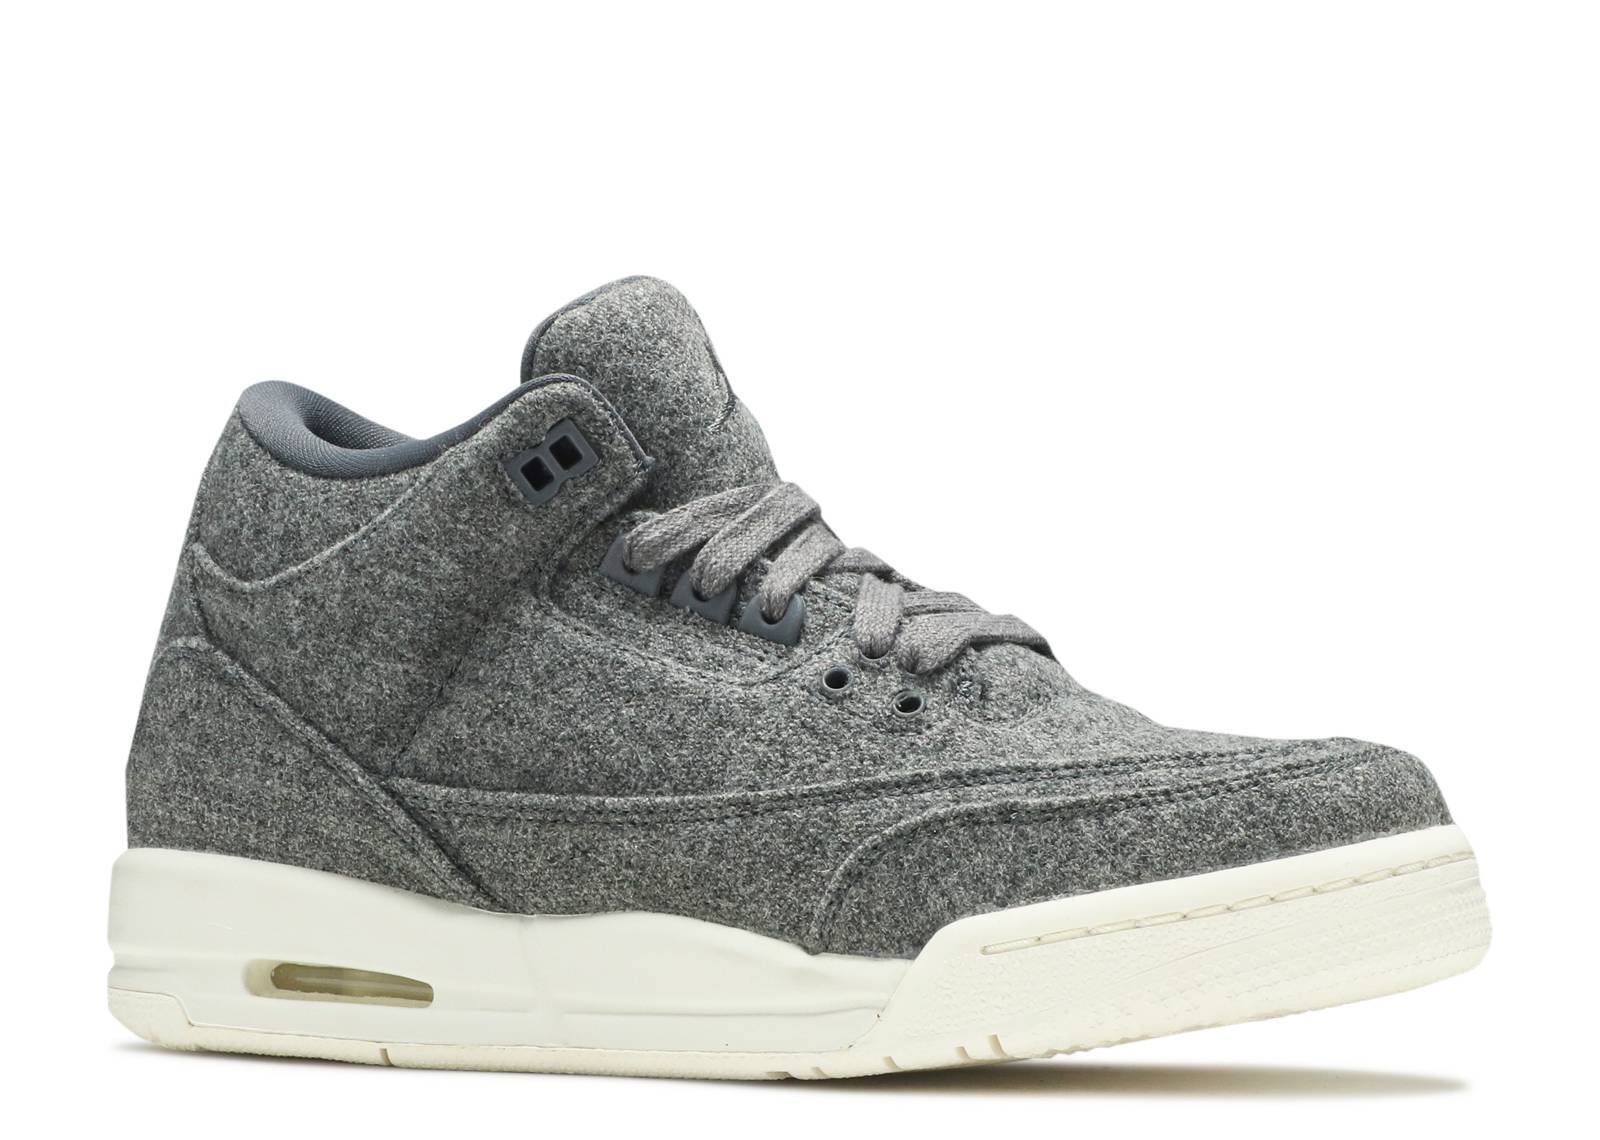 Nike Air Jordan III 3 Retro Wool BG Dark Grey//Sail Wool 861427-004 GS SZ 5Y